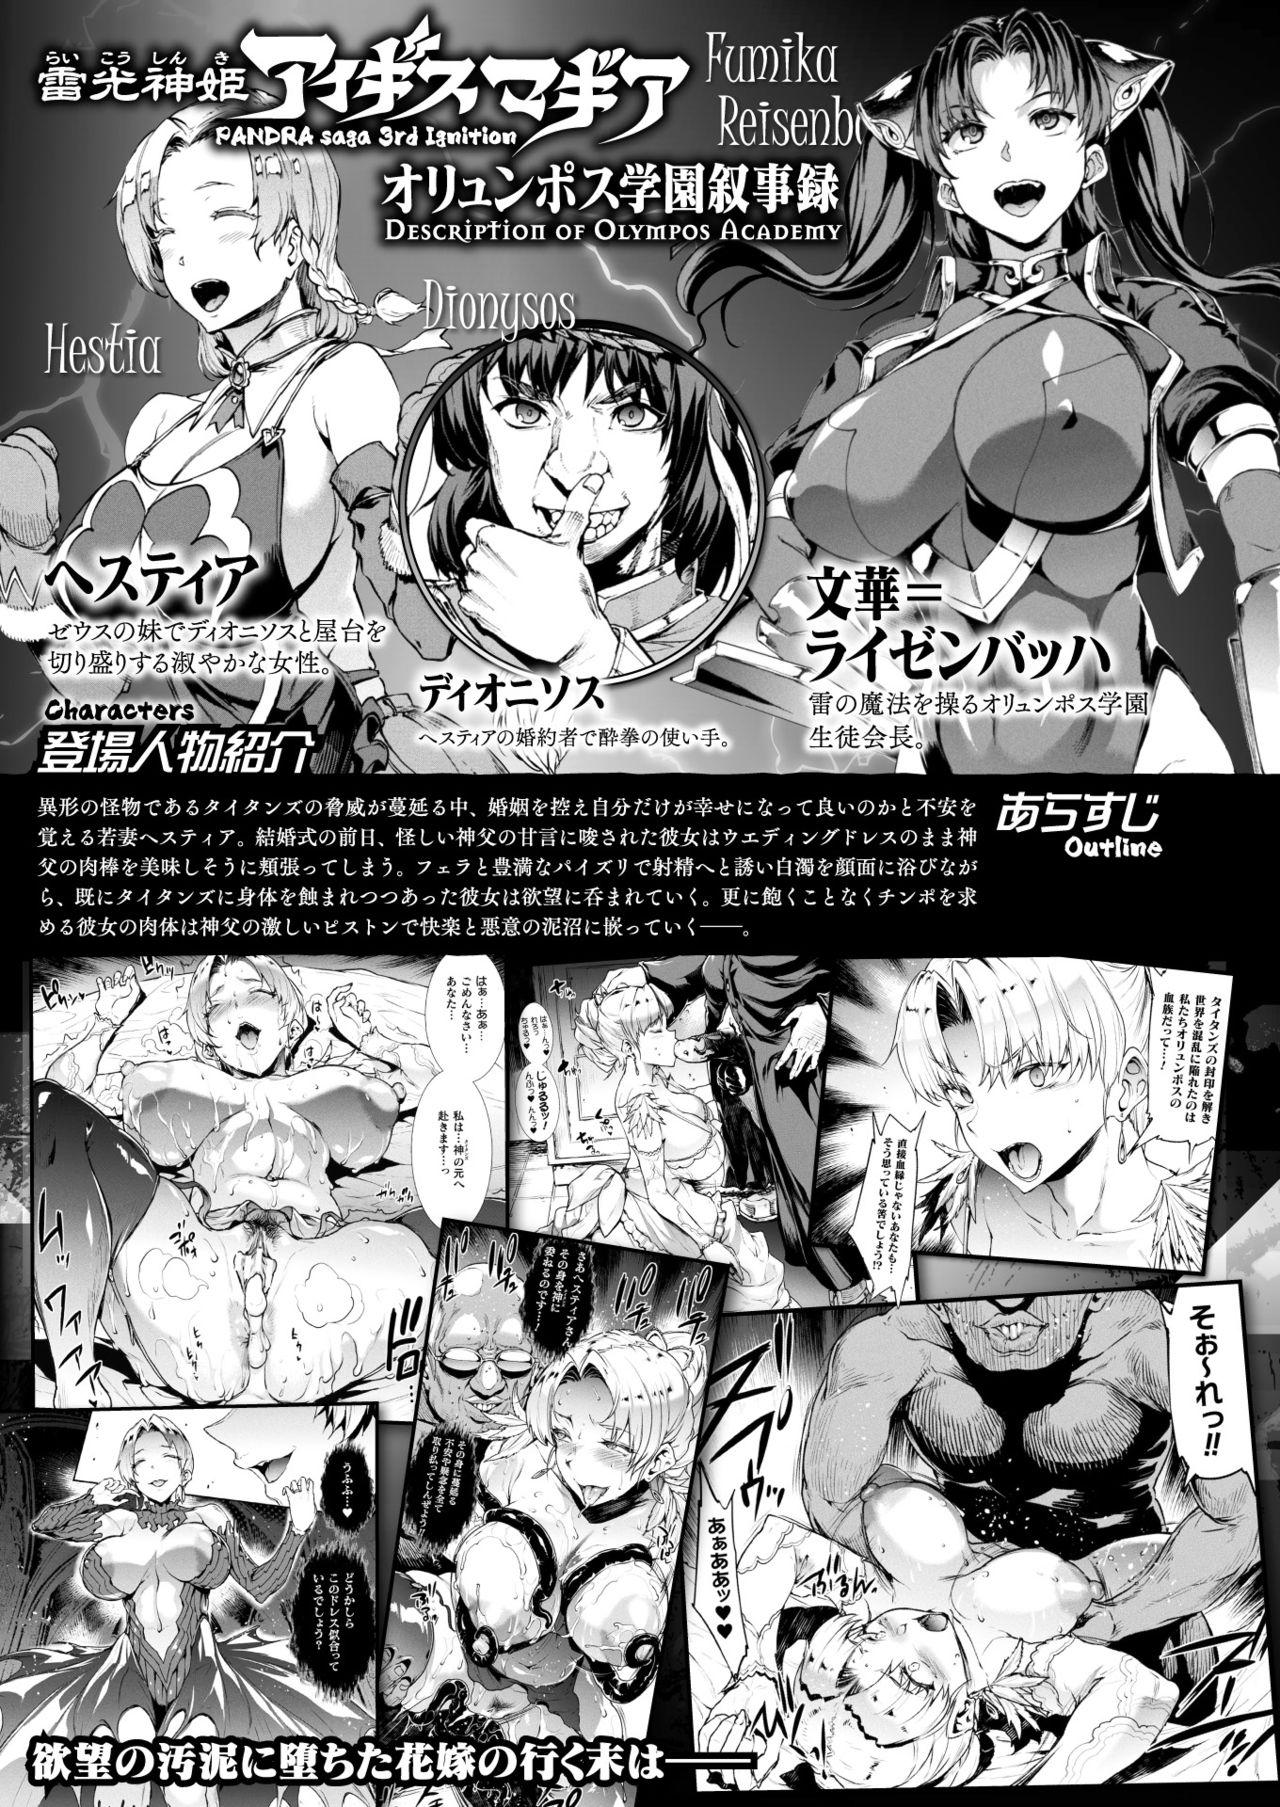 [Erect Sawaru] Raikou Shinki Igis Magia -PANDRA saga 3rd ignition- Ch. 24 (COMIC Unreal 2020-08 Vol. 86) [Chinese] [不咕鸟汉化组] [Digital] 26